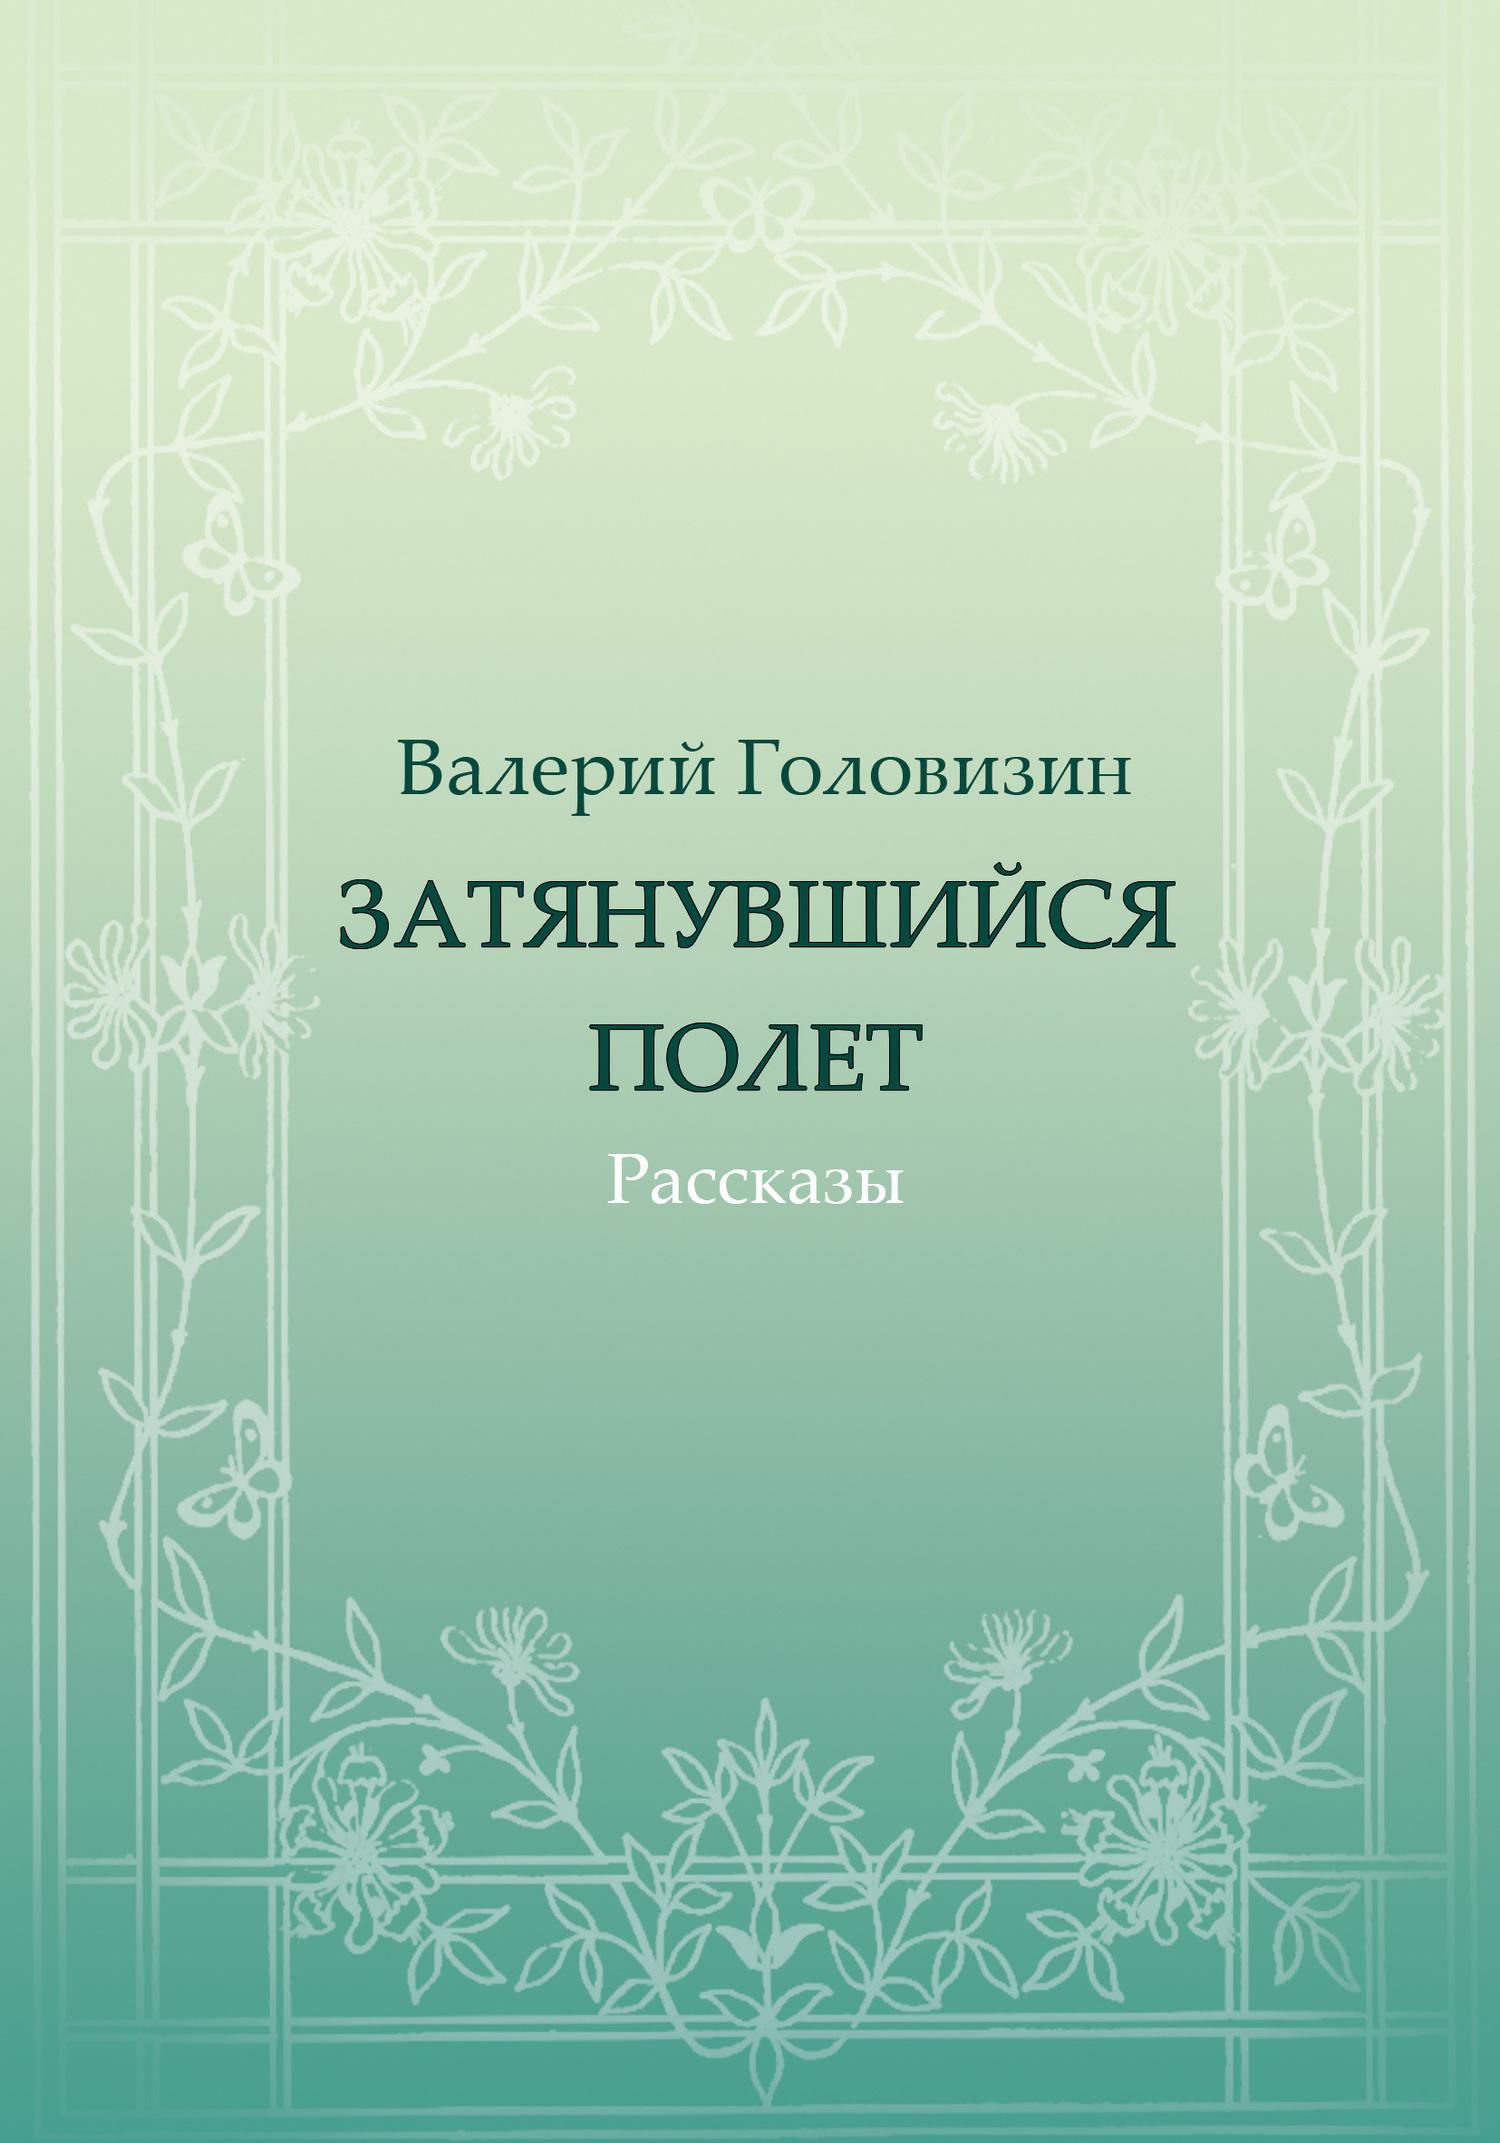 Изучим авторскую методику 35/10/12/35101247.bin.dir/35101247.cover.jpg читаем